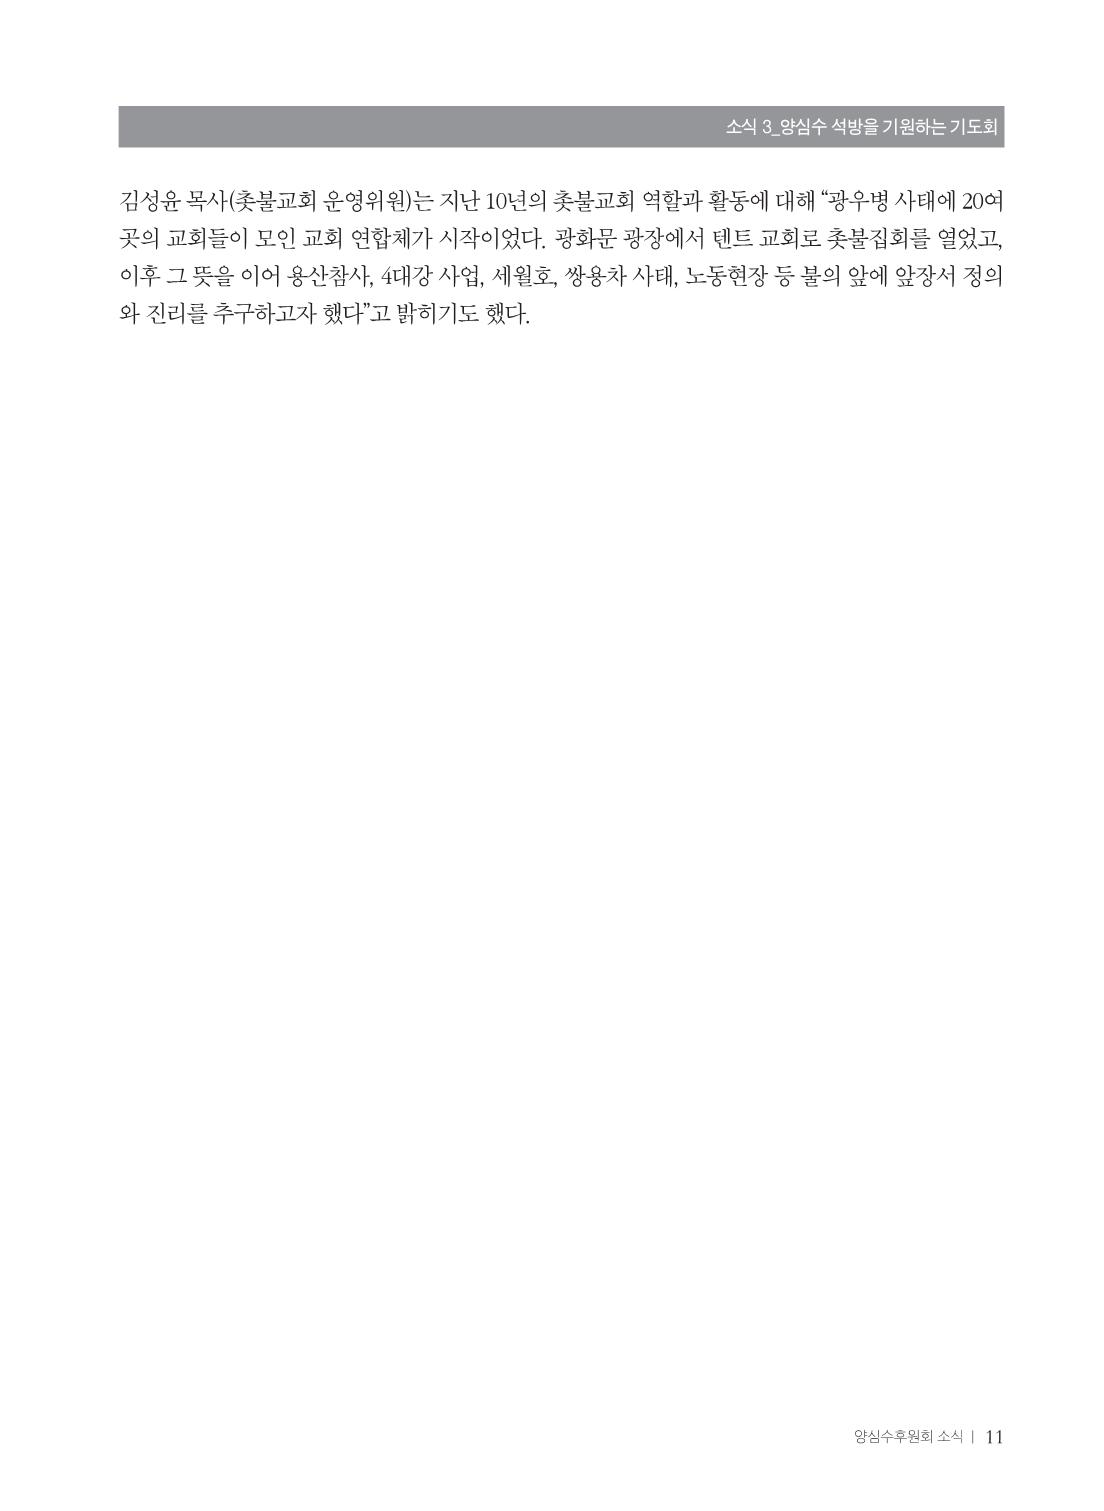 5802db1f-6a90-451c-ac2e-da2a23bee939.pdf-0013.jpg